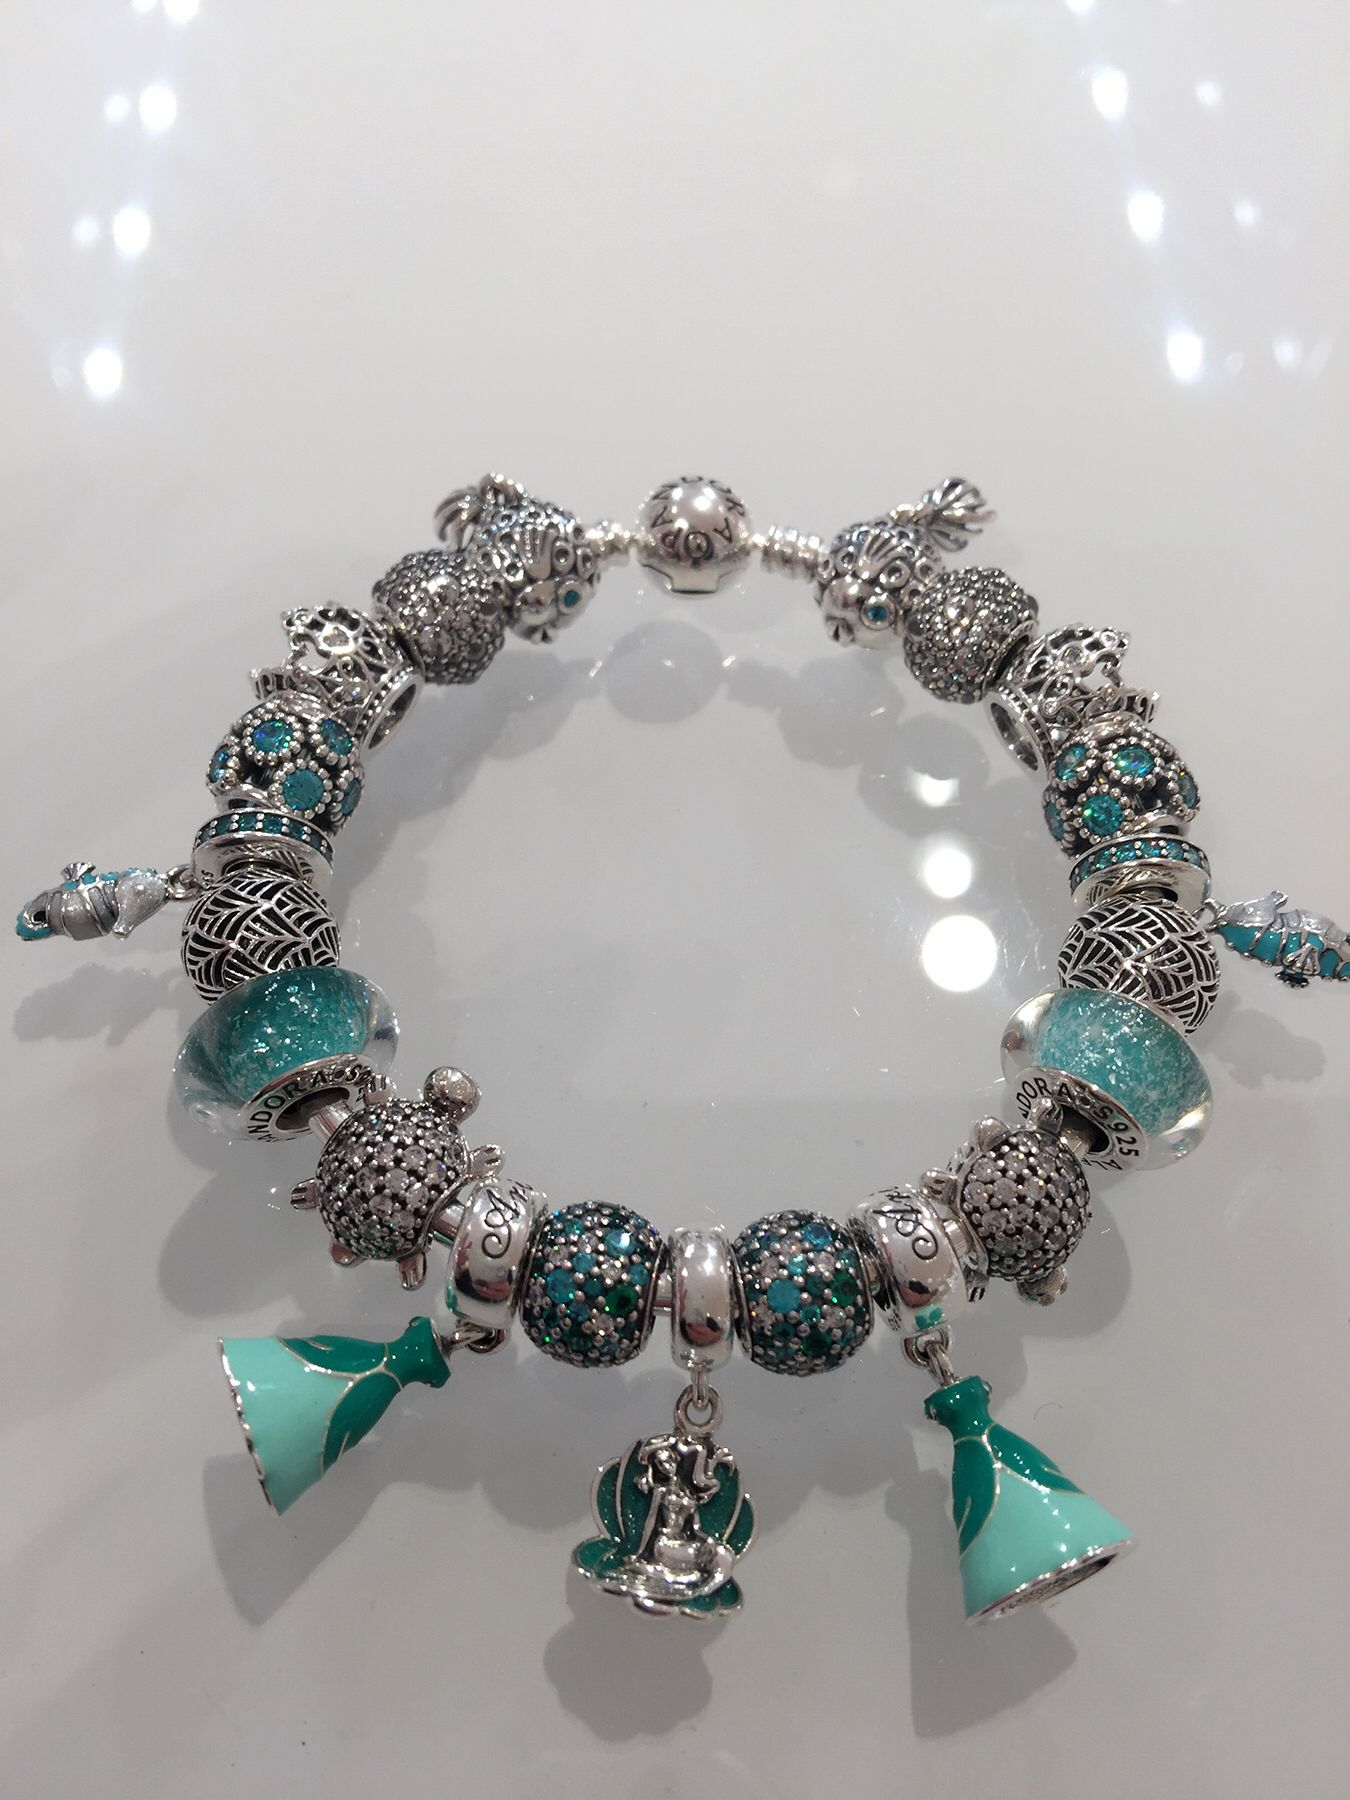 bbcd0f18986 Ariel inspired Pandora Bracelet | Pandora Jewelry | Pandora, Pandora ...